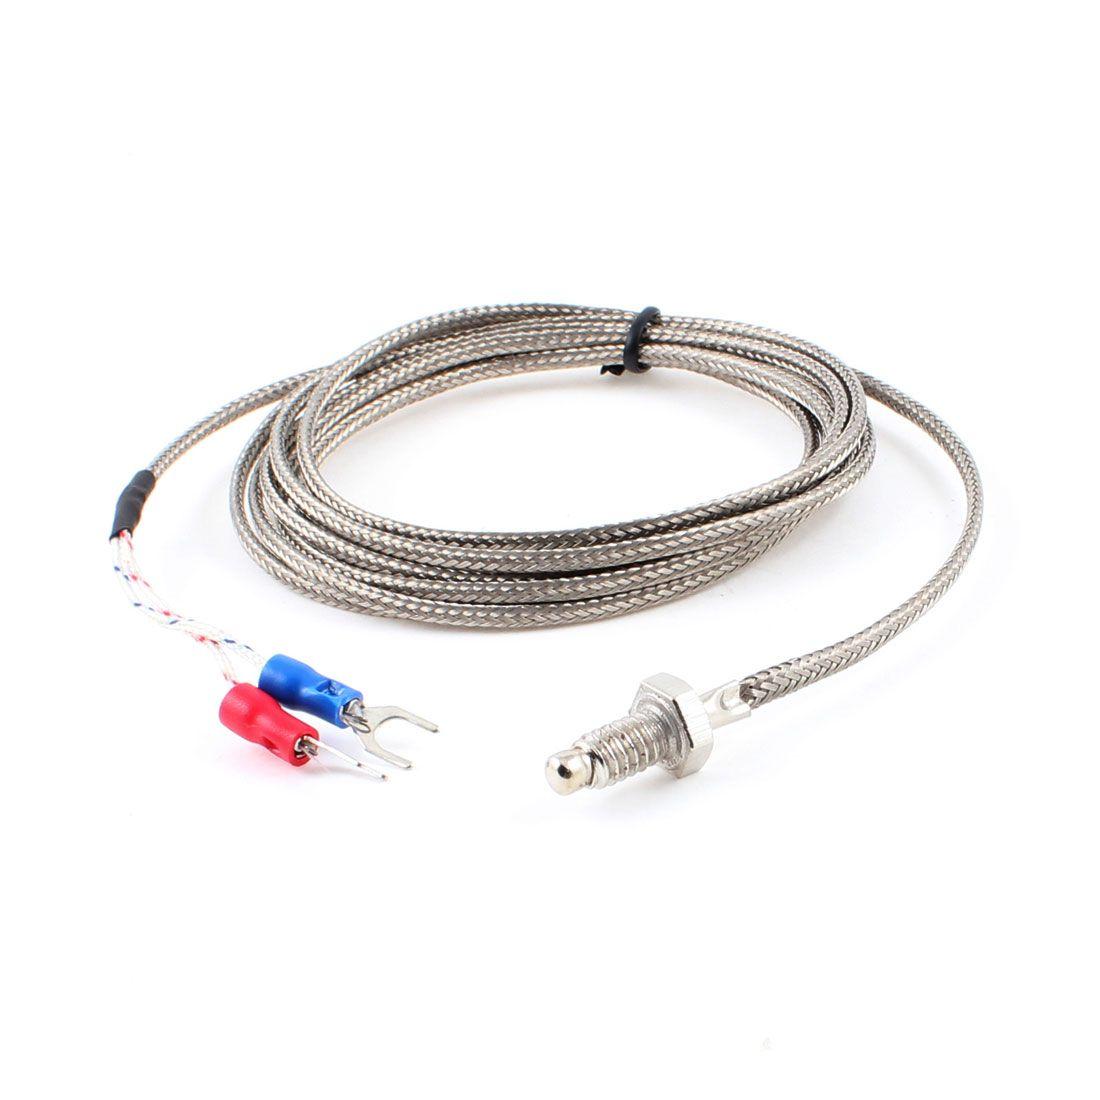 Uxcell 6Mm Thread K Type Thermocouple Temperature Measurement Sensor 2 Meters . | 400c | 600c | 800c